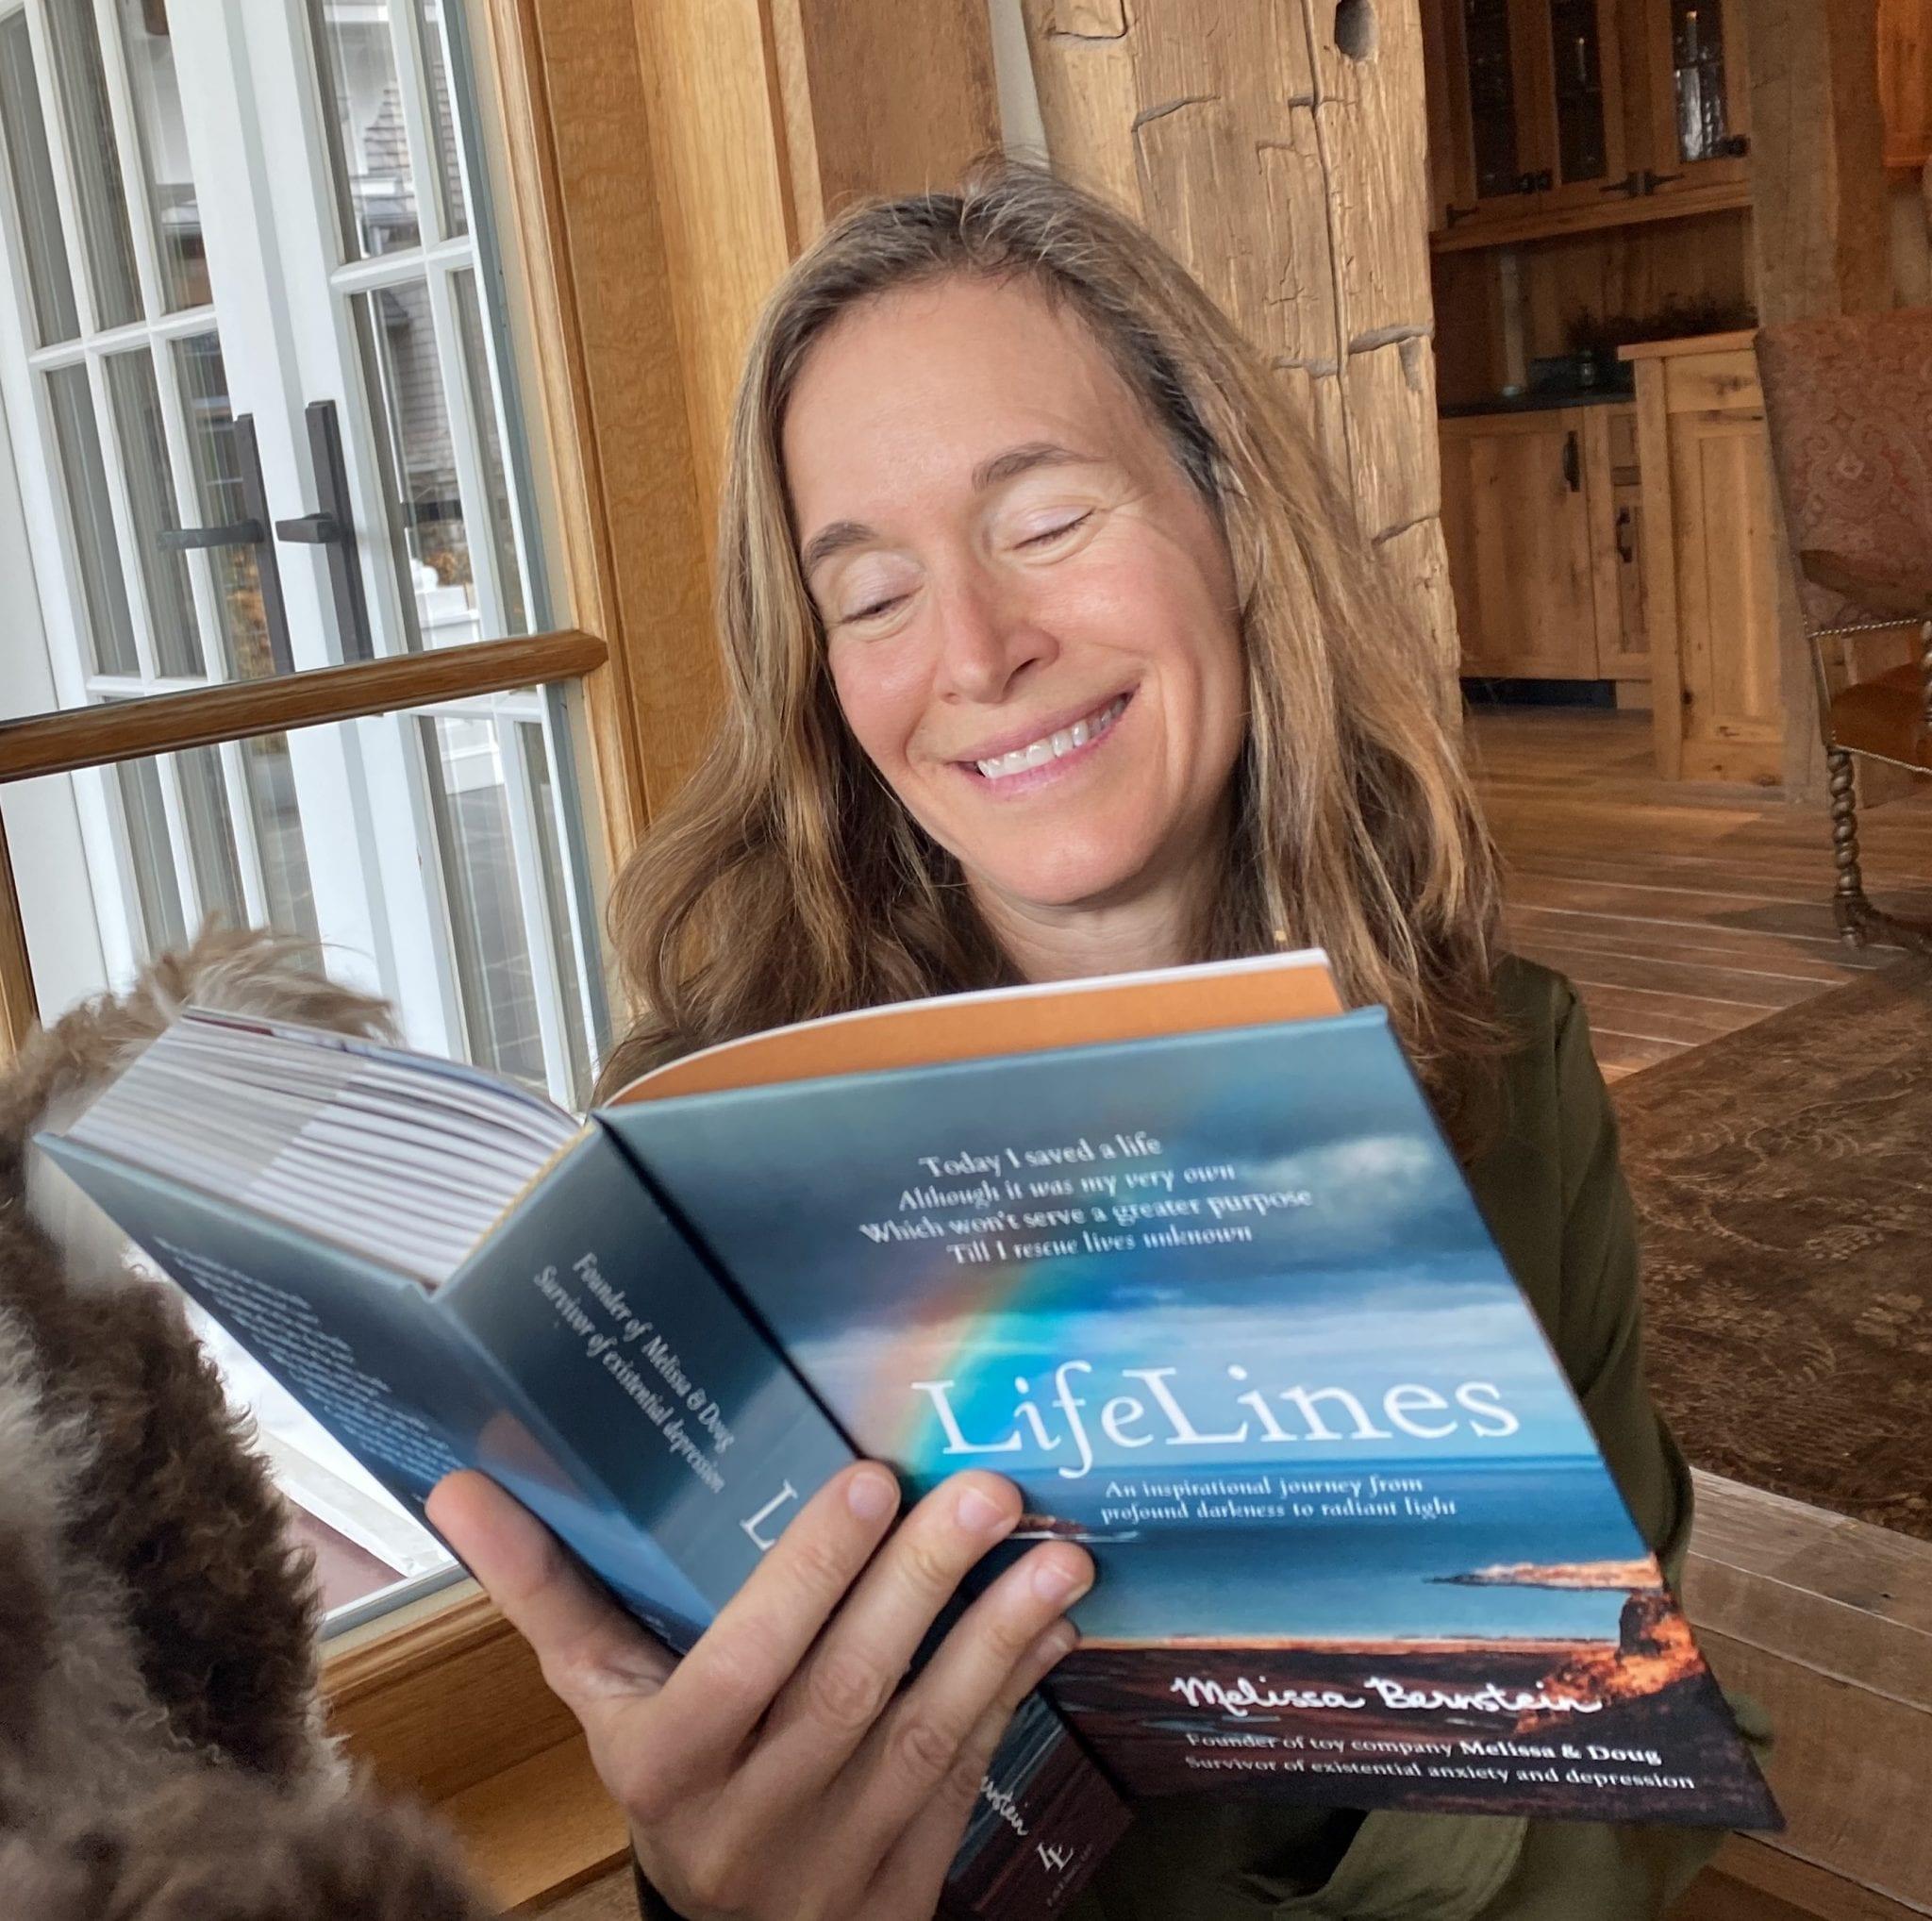 Melissa Bernstein, Co-Founder of 'Melissa & Doug' Toys and Author of LifeLines